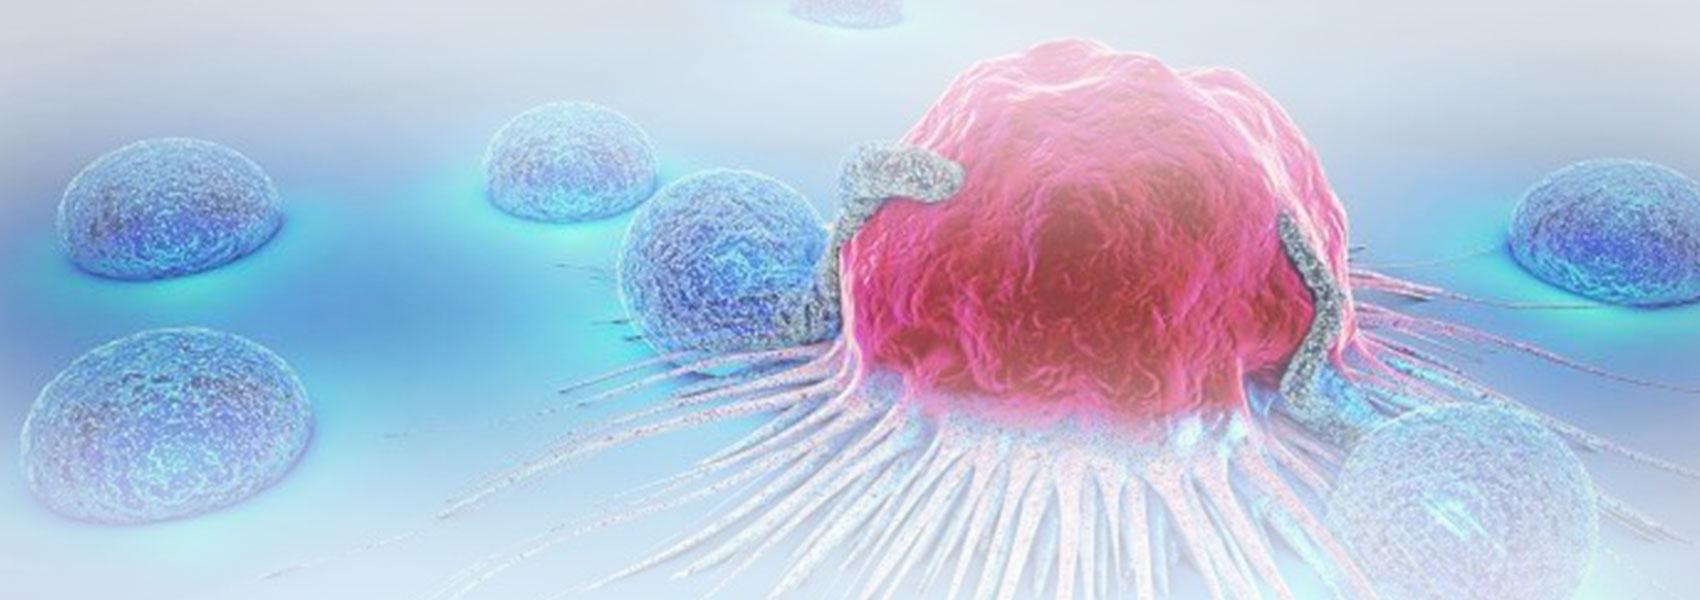 Cancer-Diagnosis-Malpractice-main